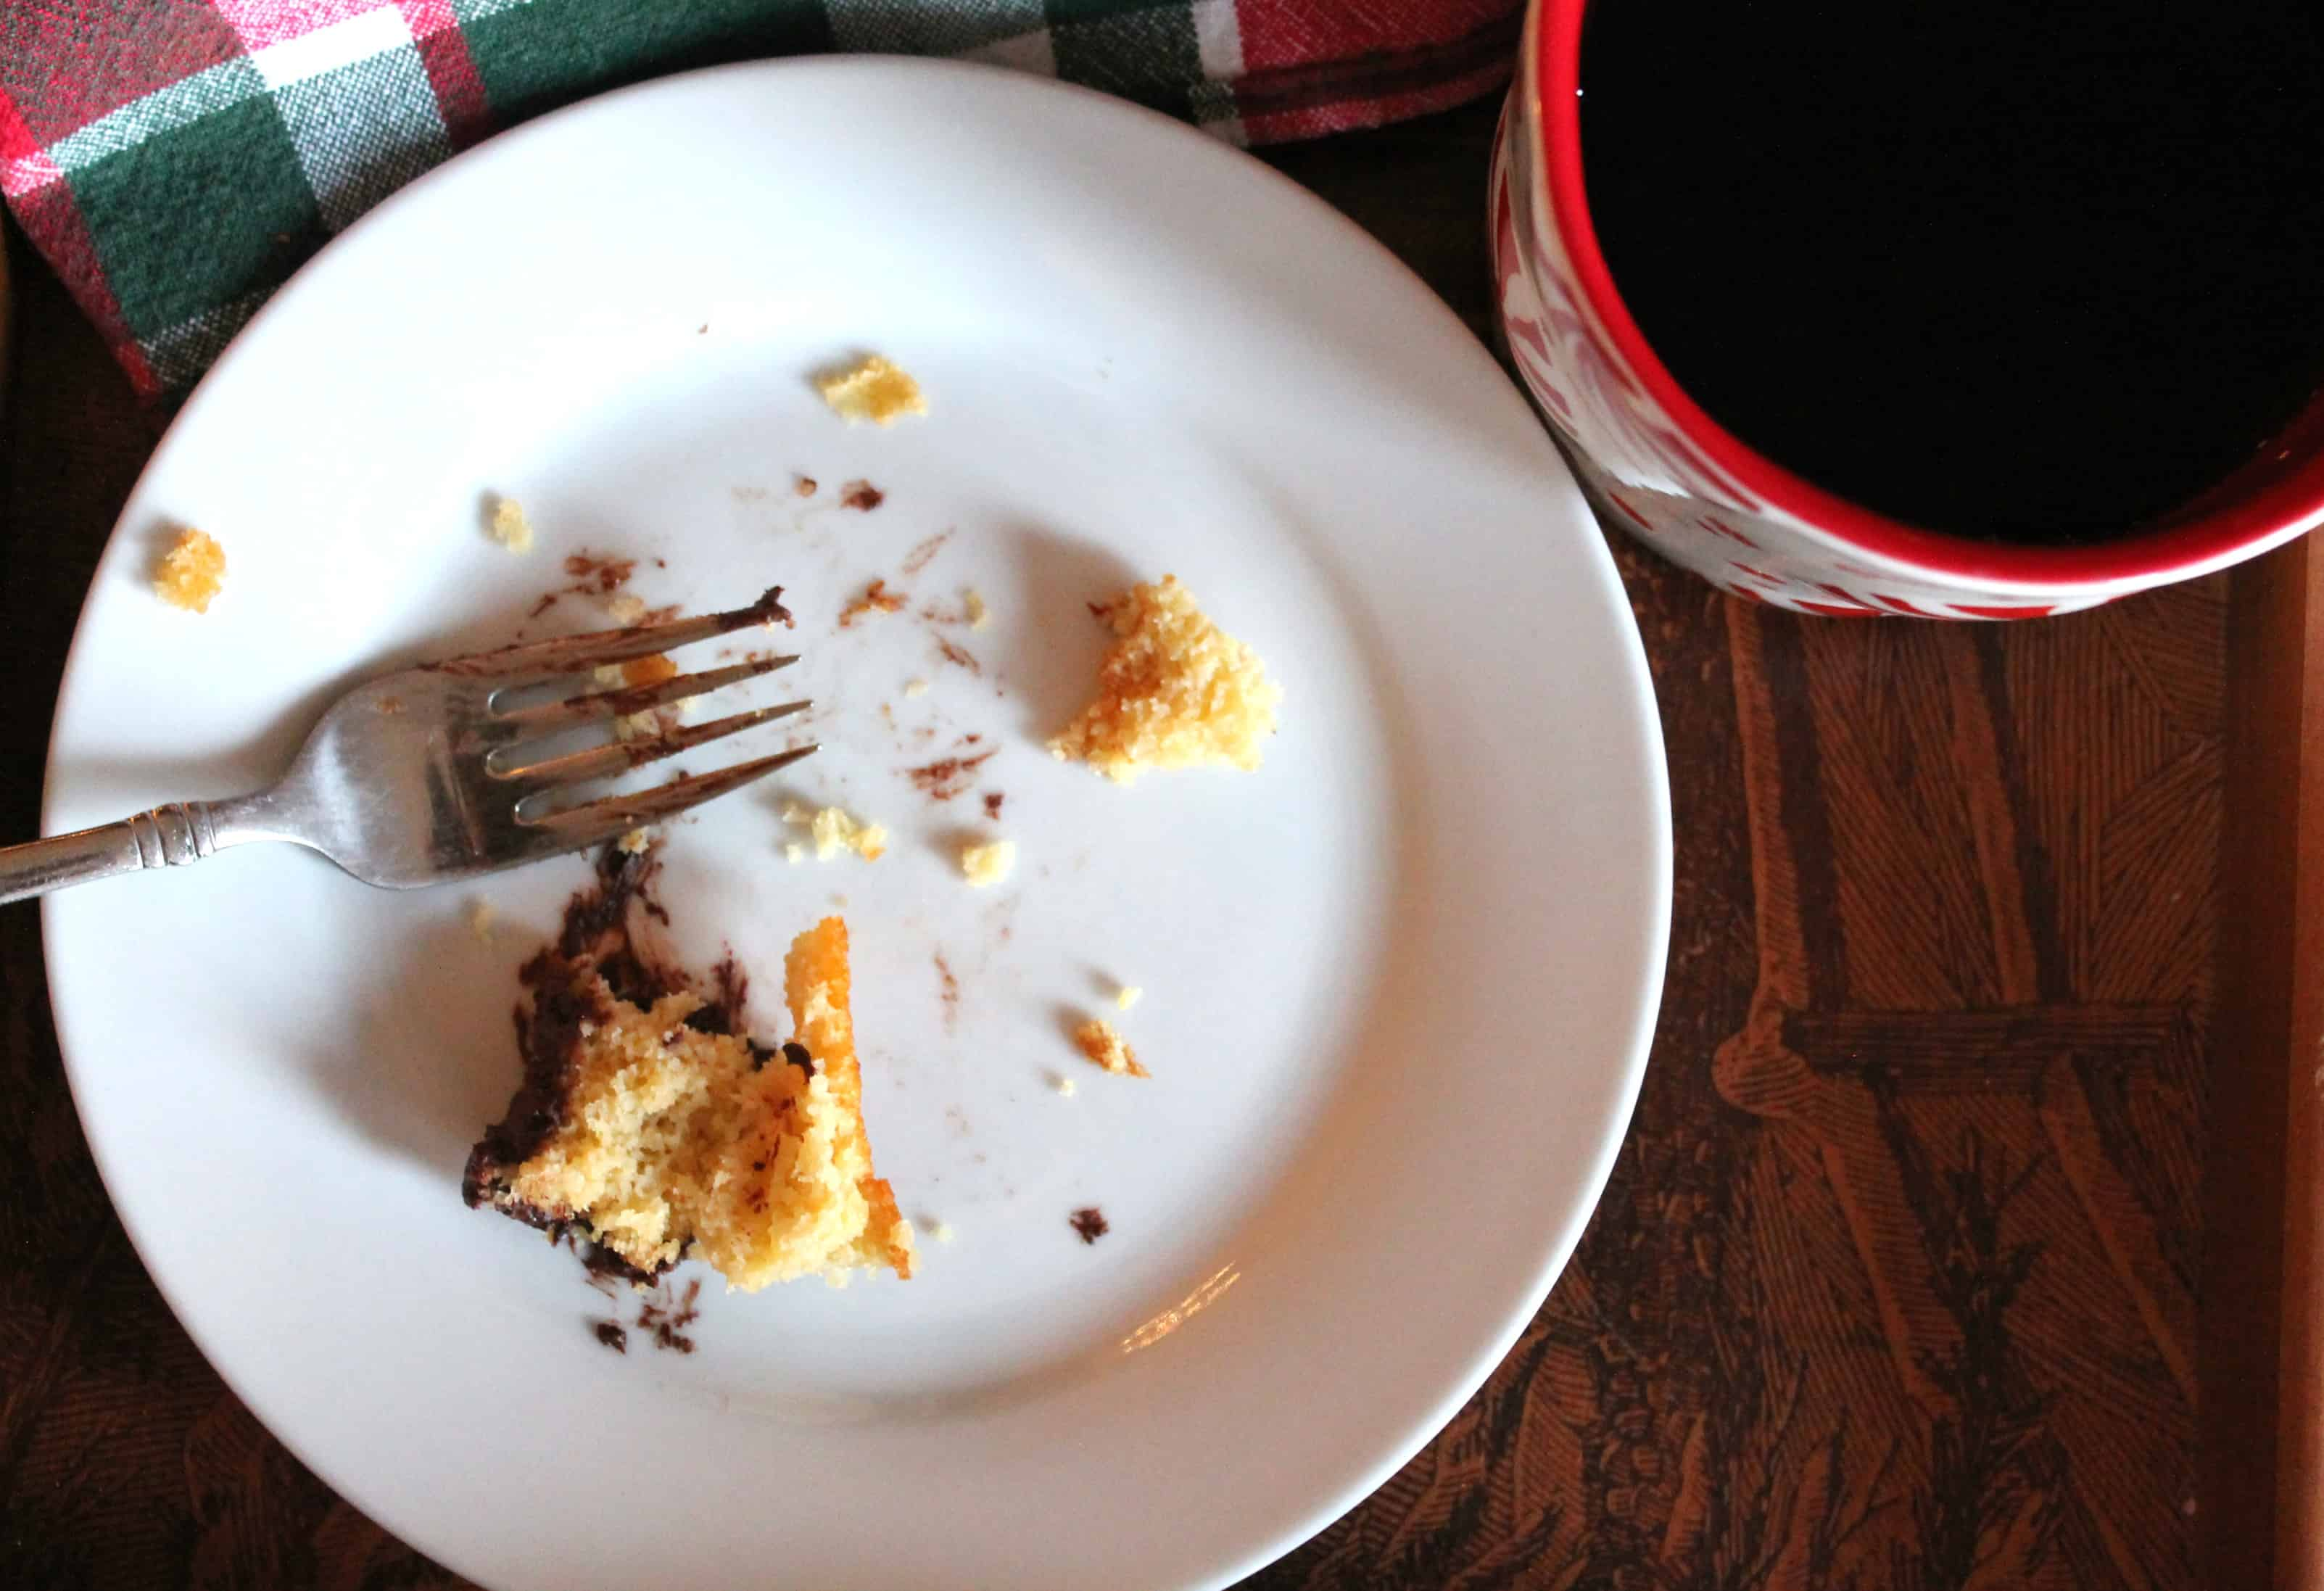 Vanilla Cake with Chocolate Espresso Frosting (Gluten Free | Paleo)